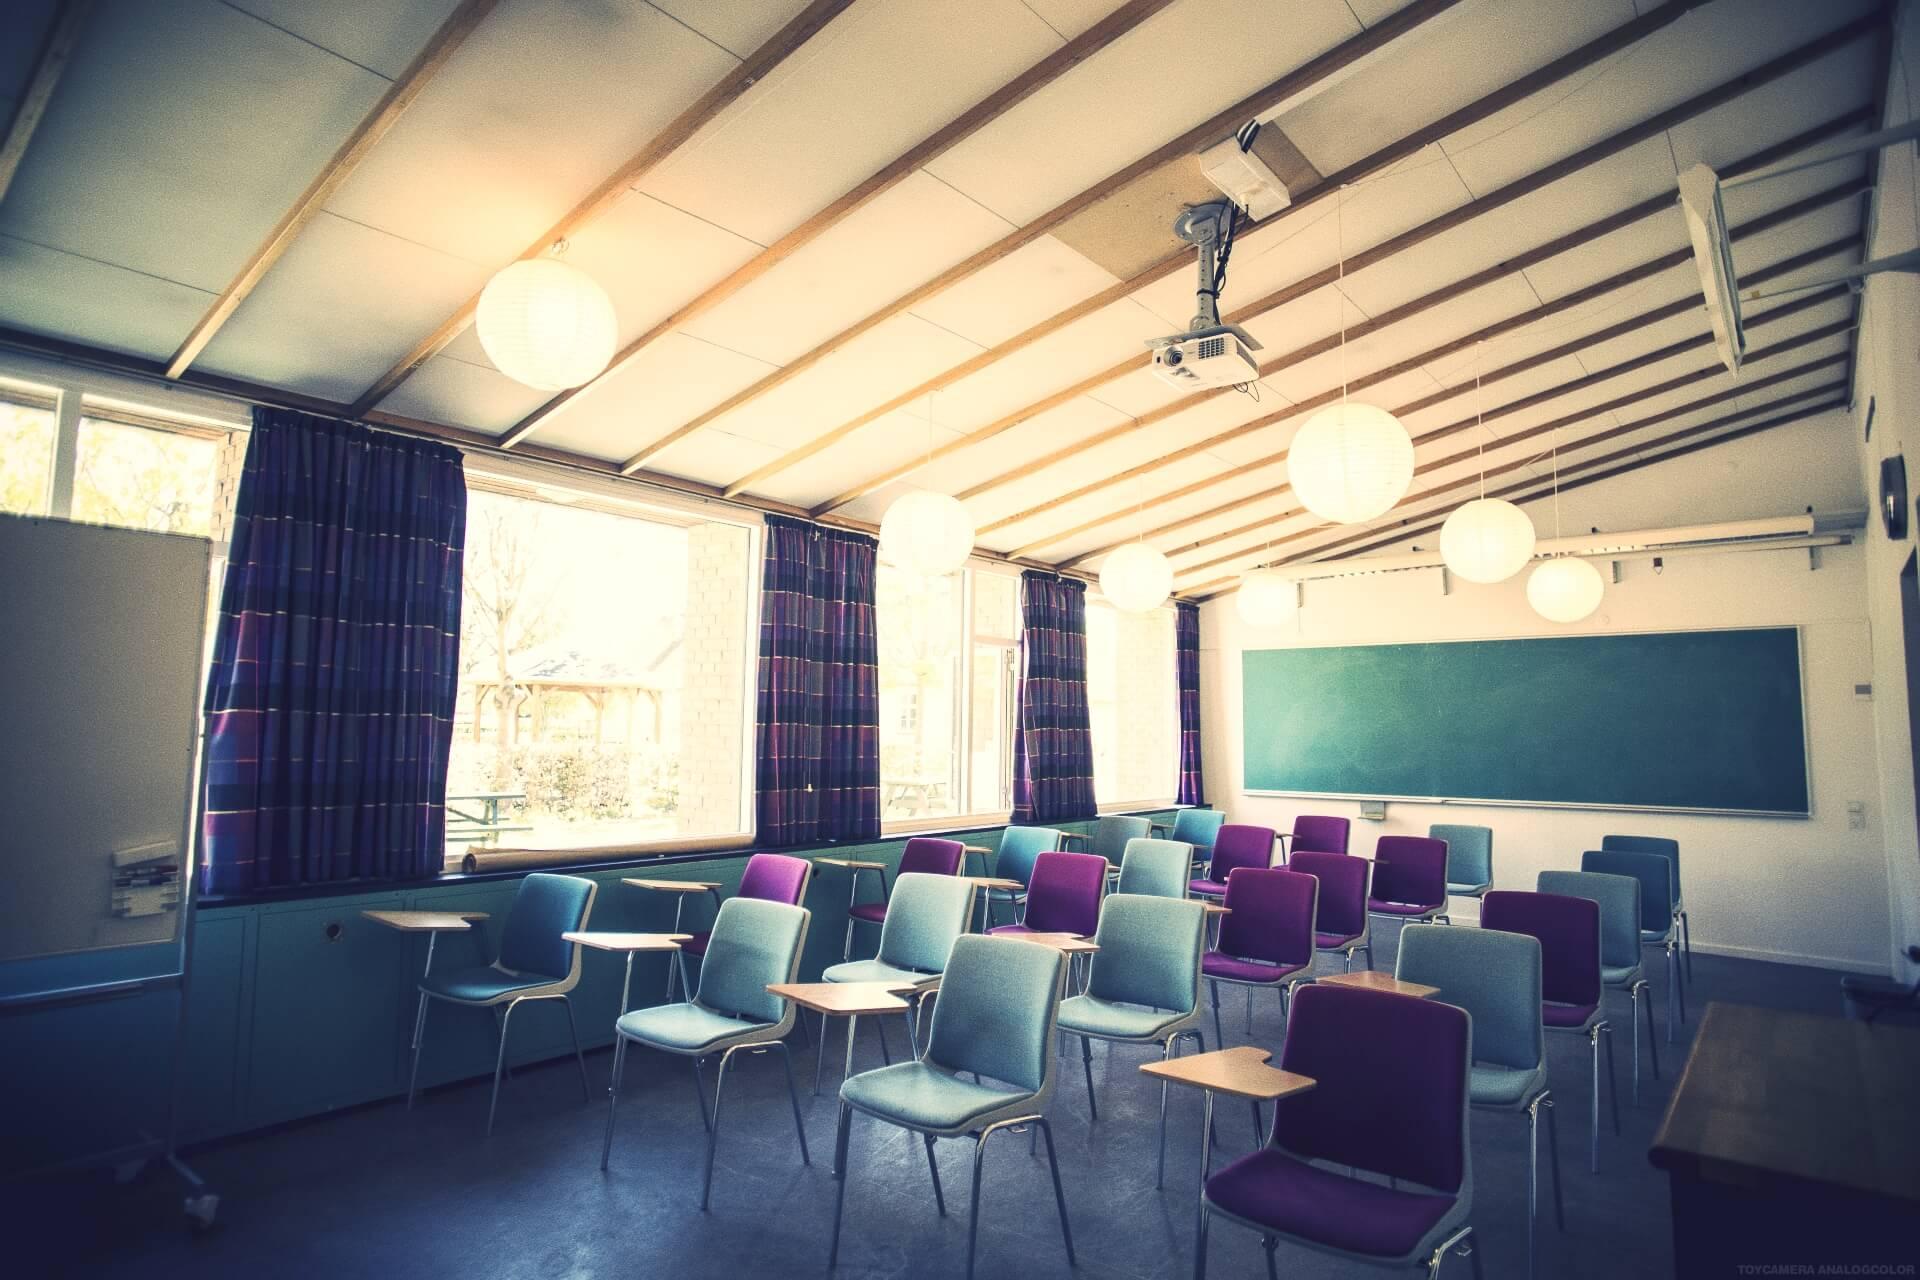 Folk high school classroom at Internatioal People's College in Denmark 1